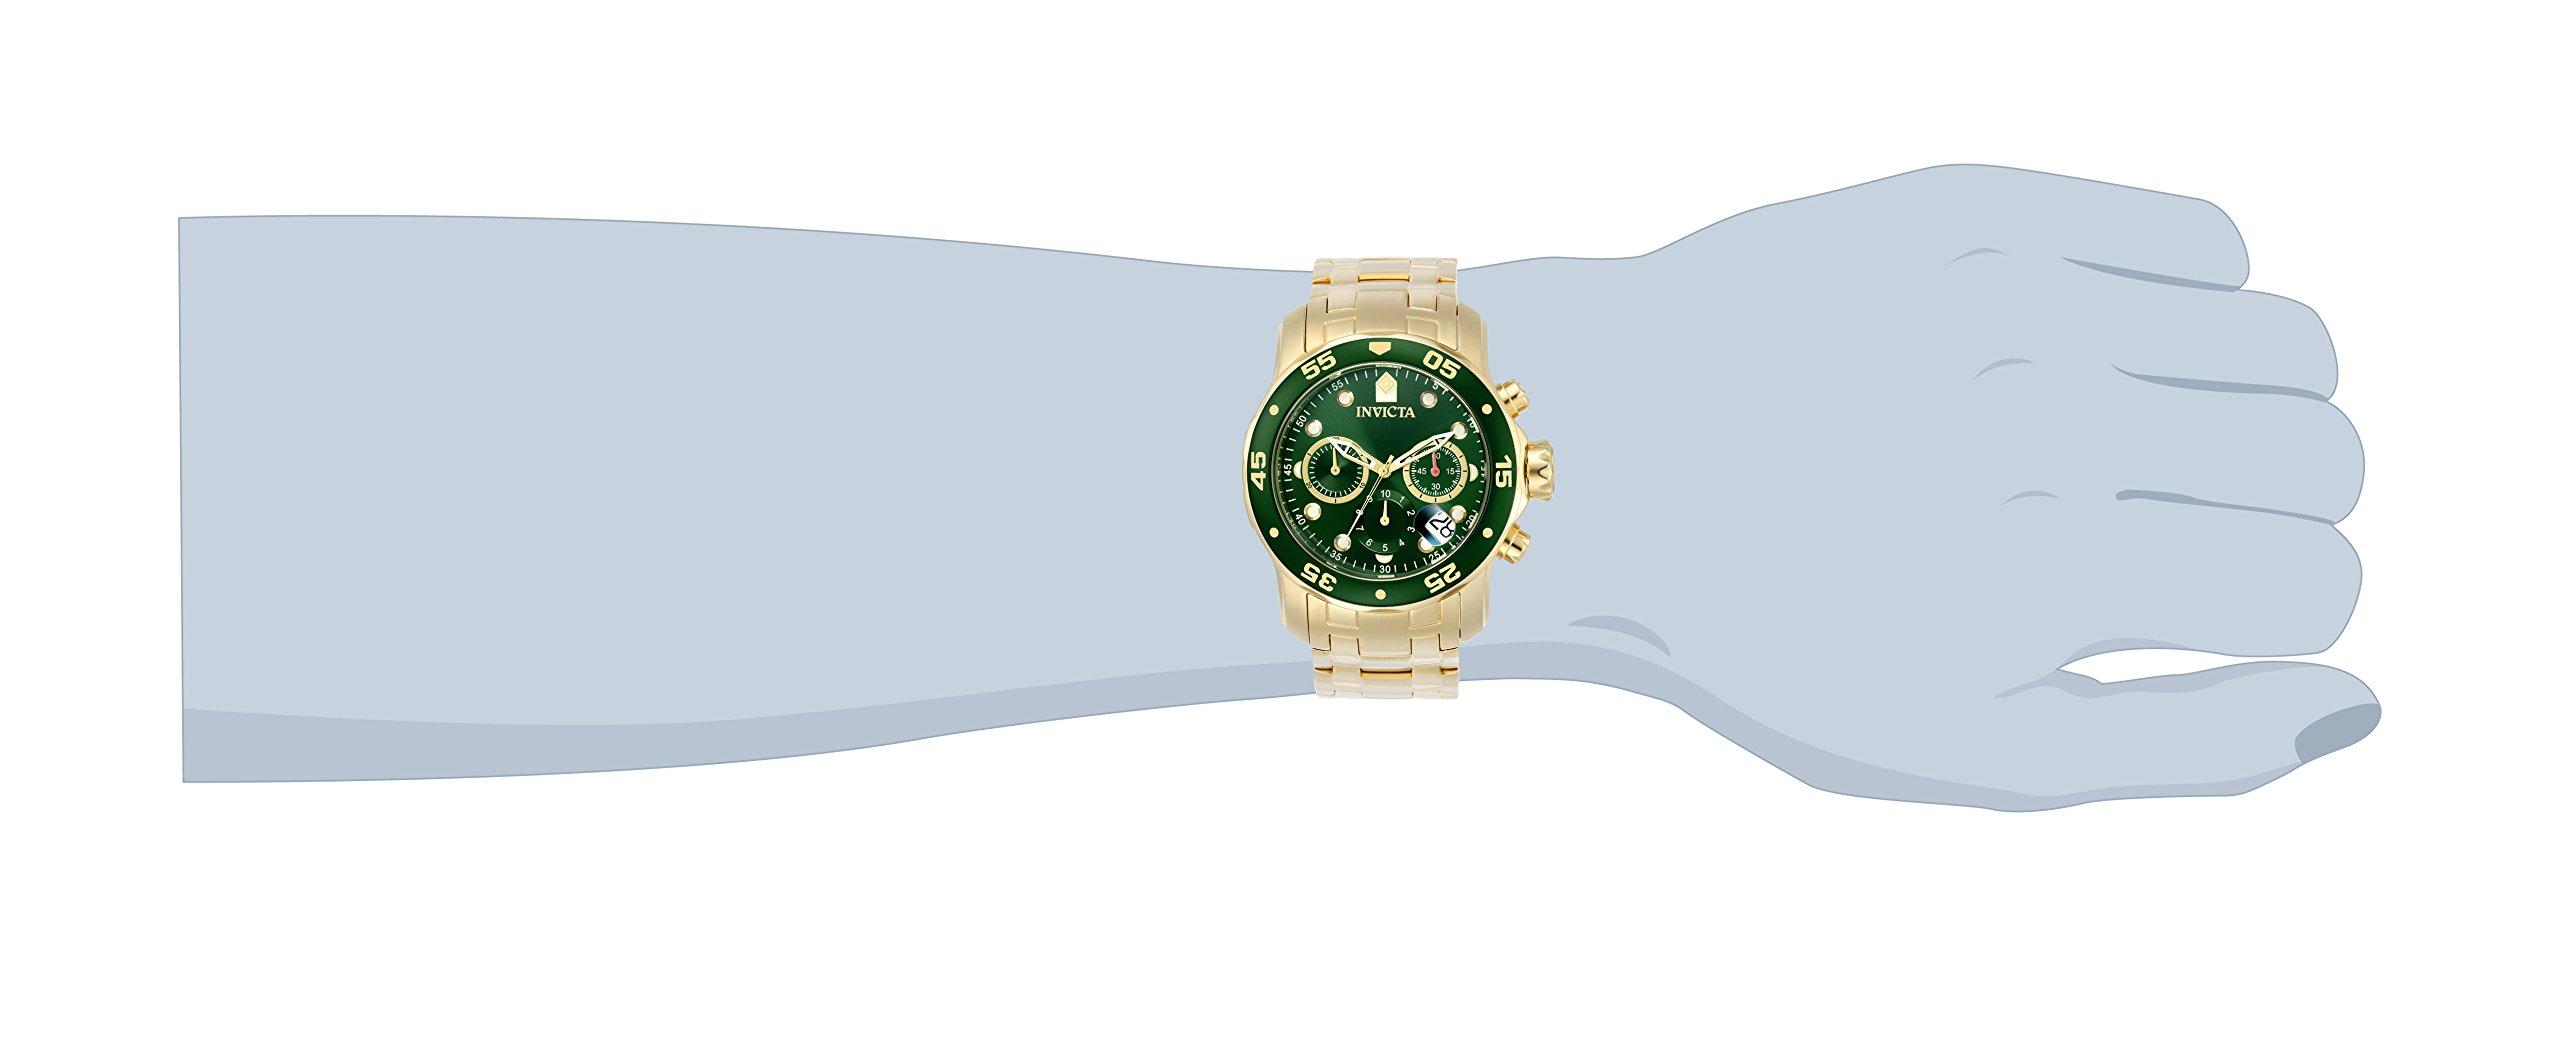 Invicta Men's 0075 Pro Diver Chronograph 18k Gold-Plated Watch by Invicta (Image #3)